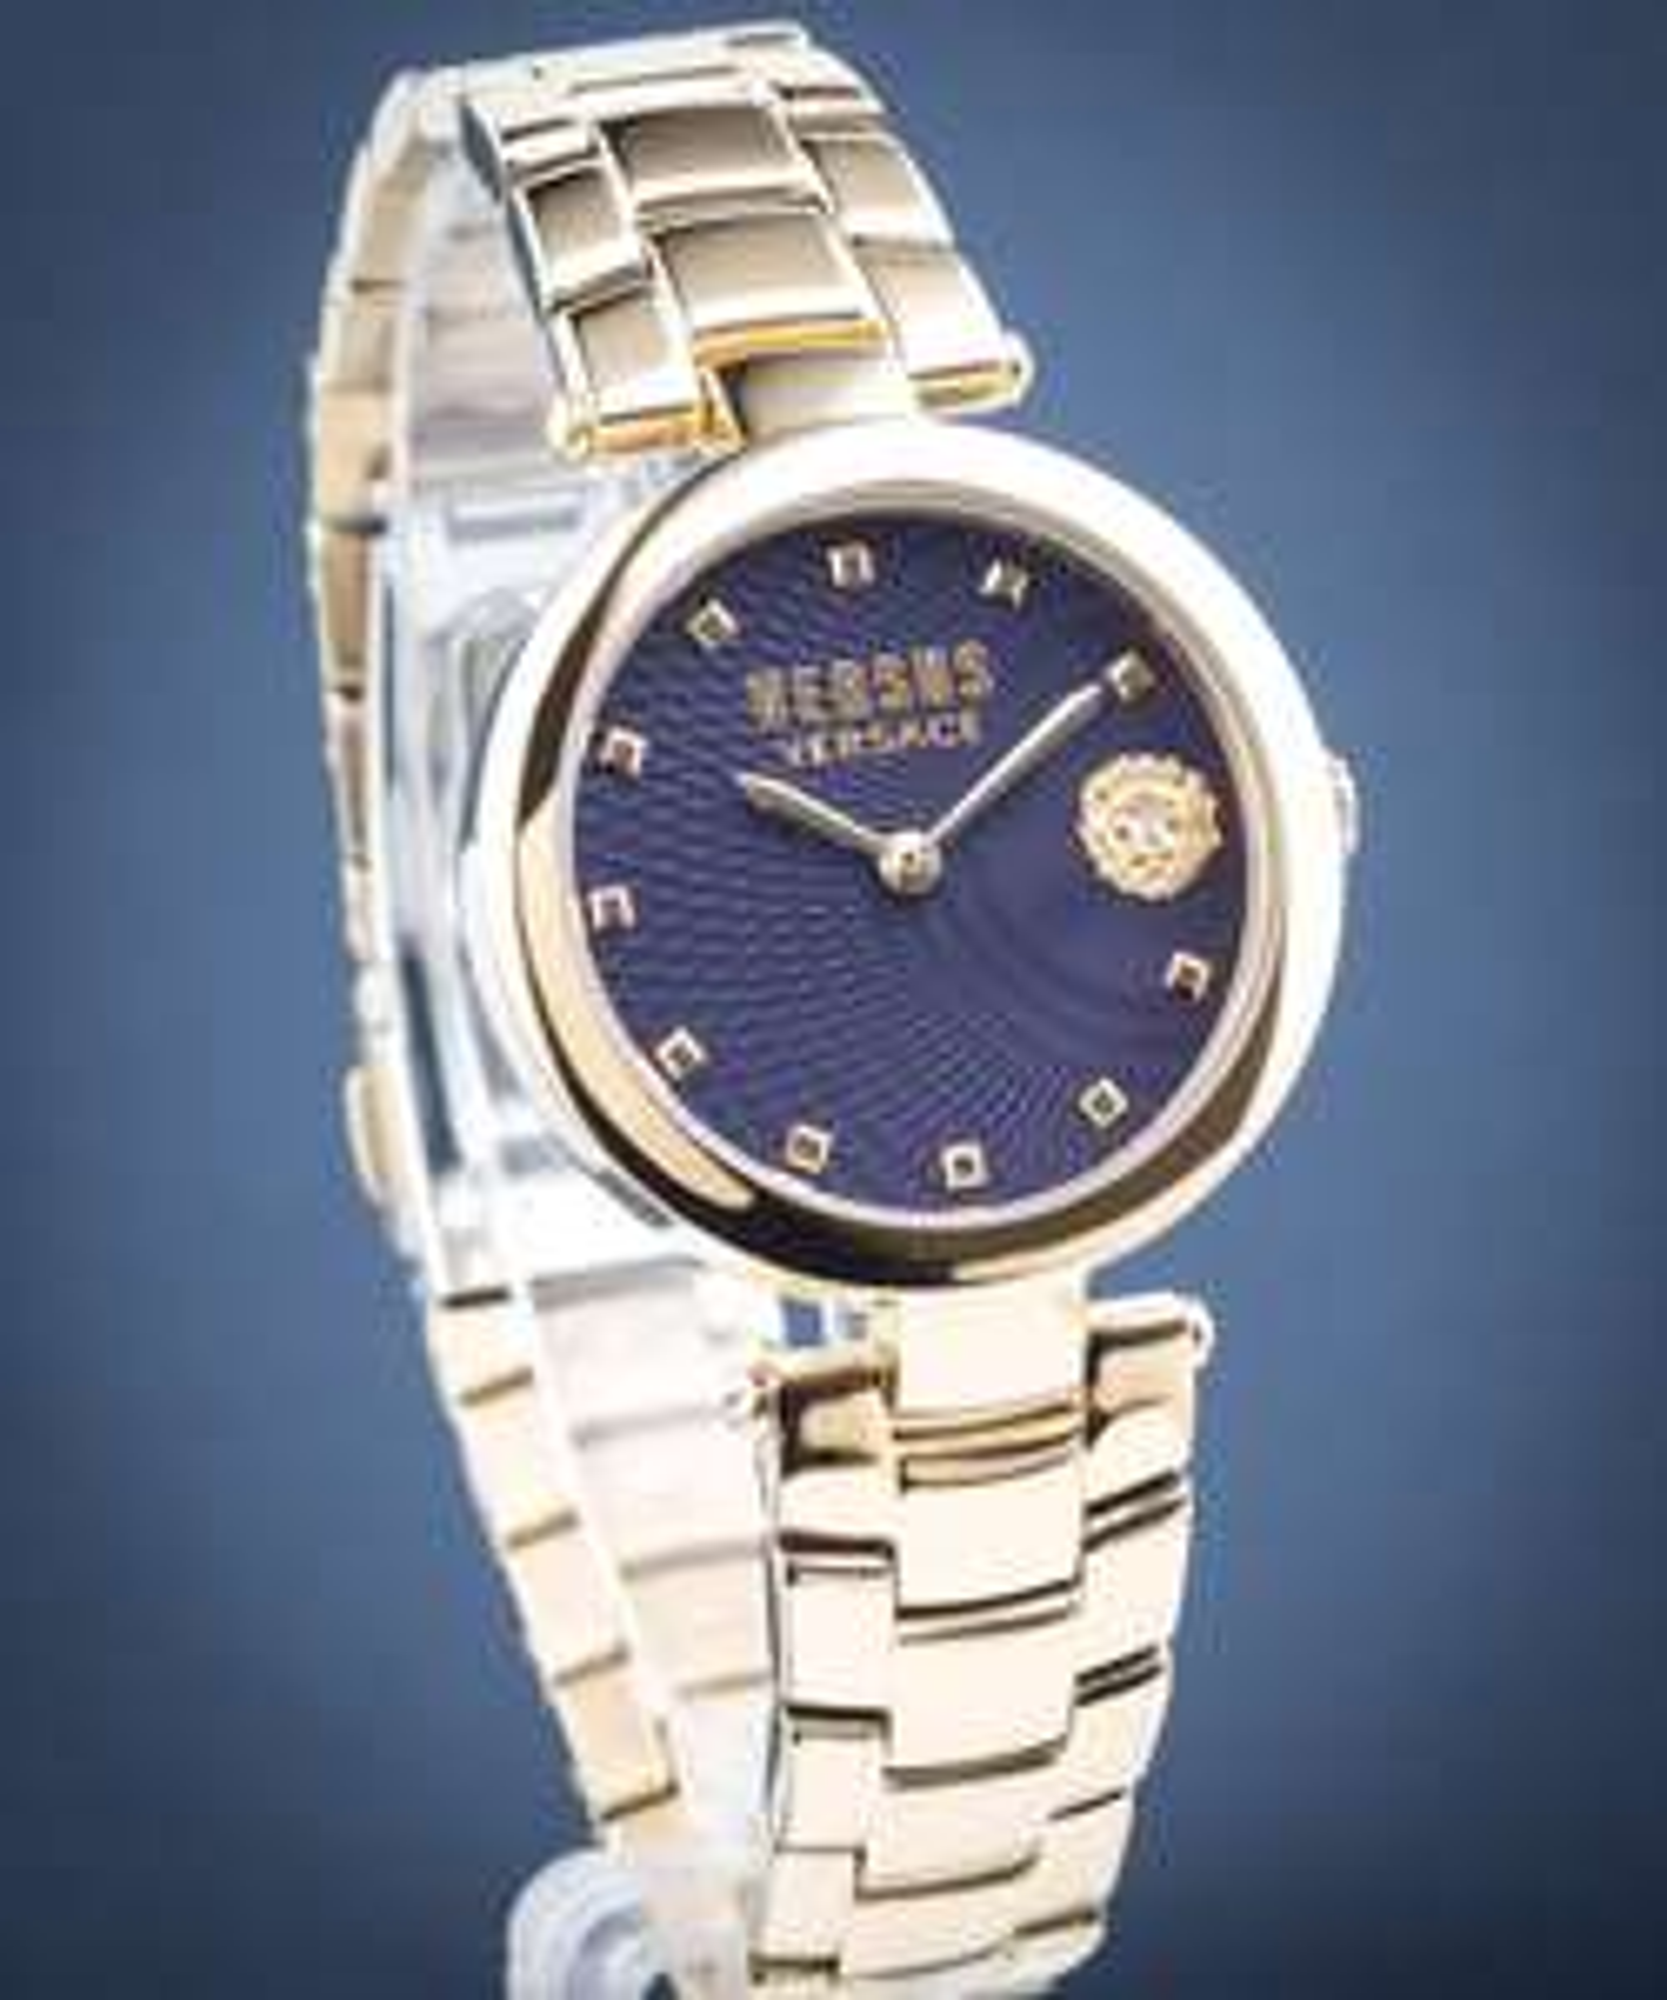 Damski zegarek Versus Versace Buffle Bay za 399zł @ Zegarownia